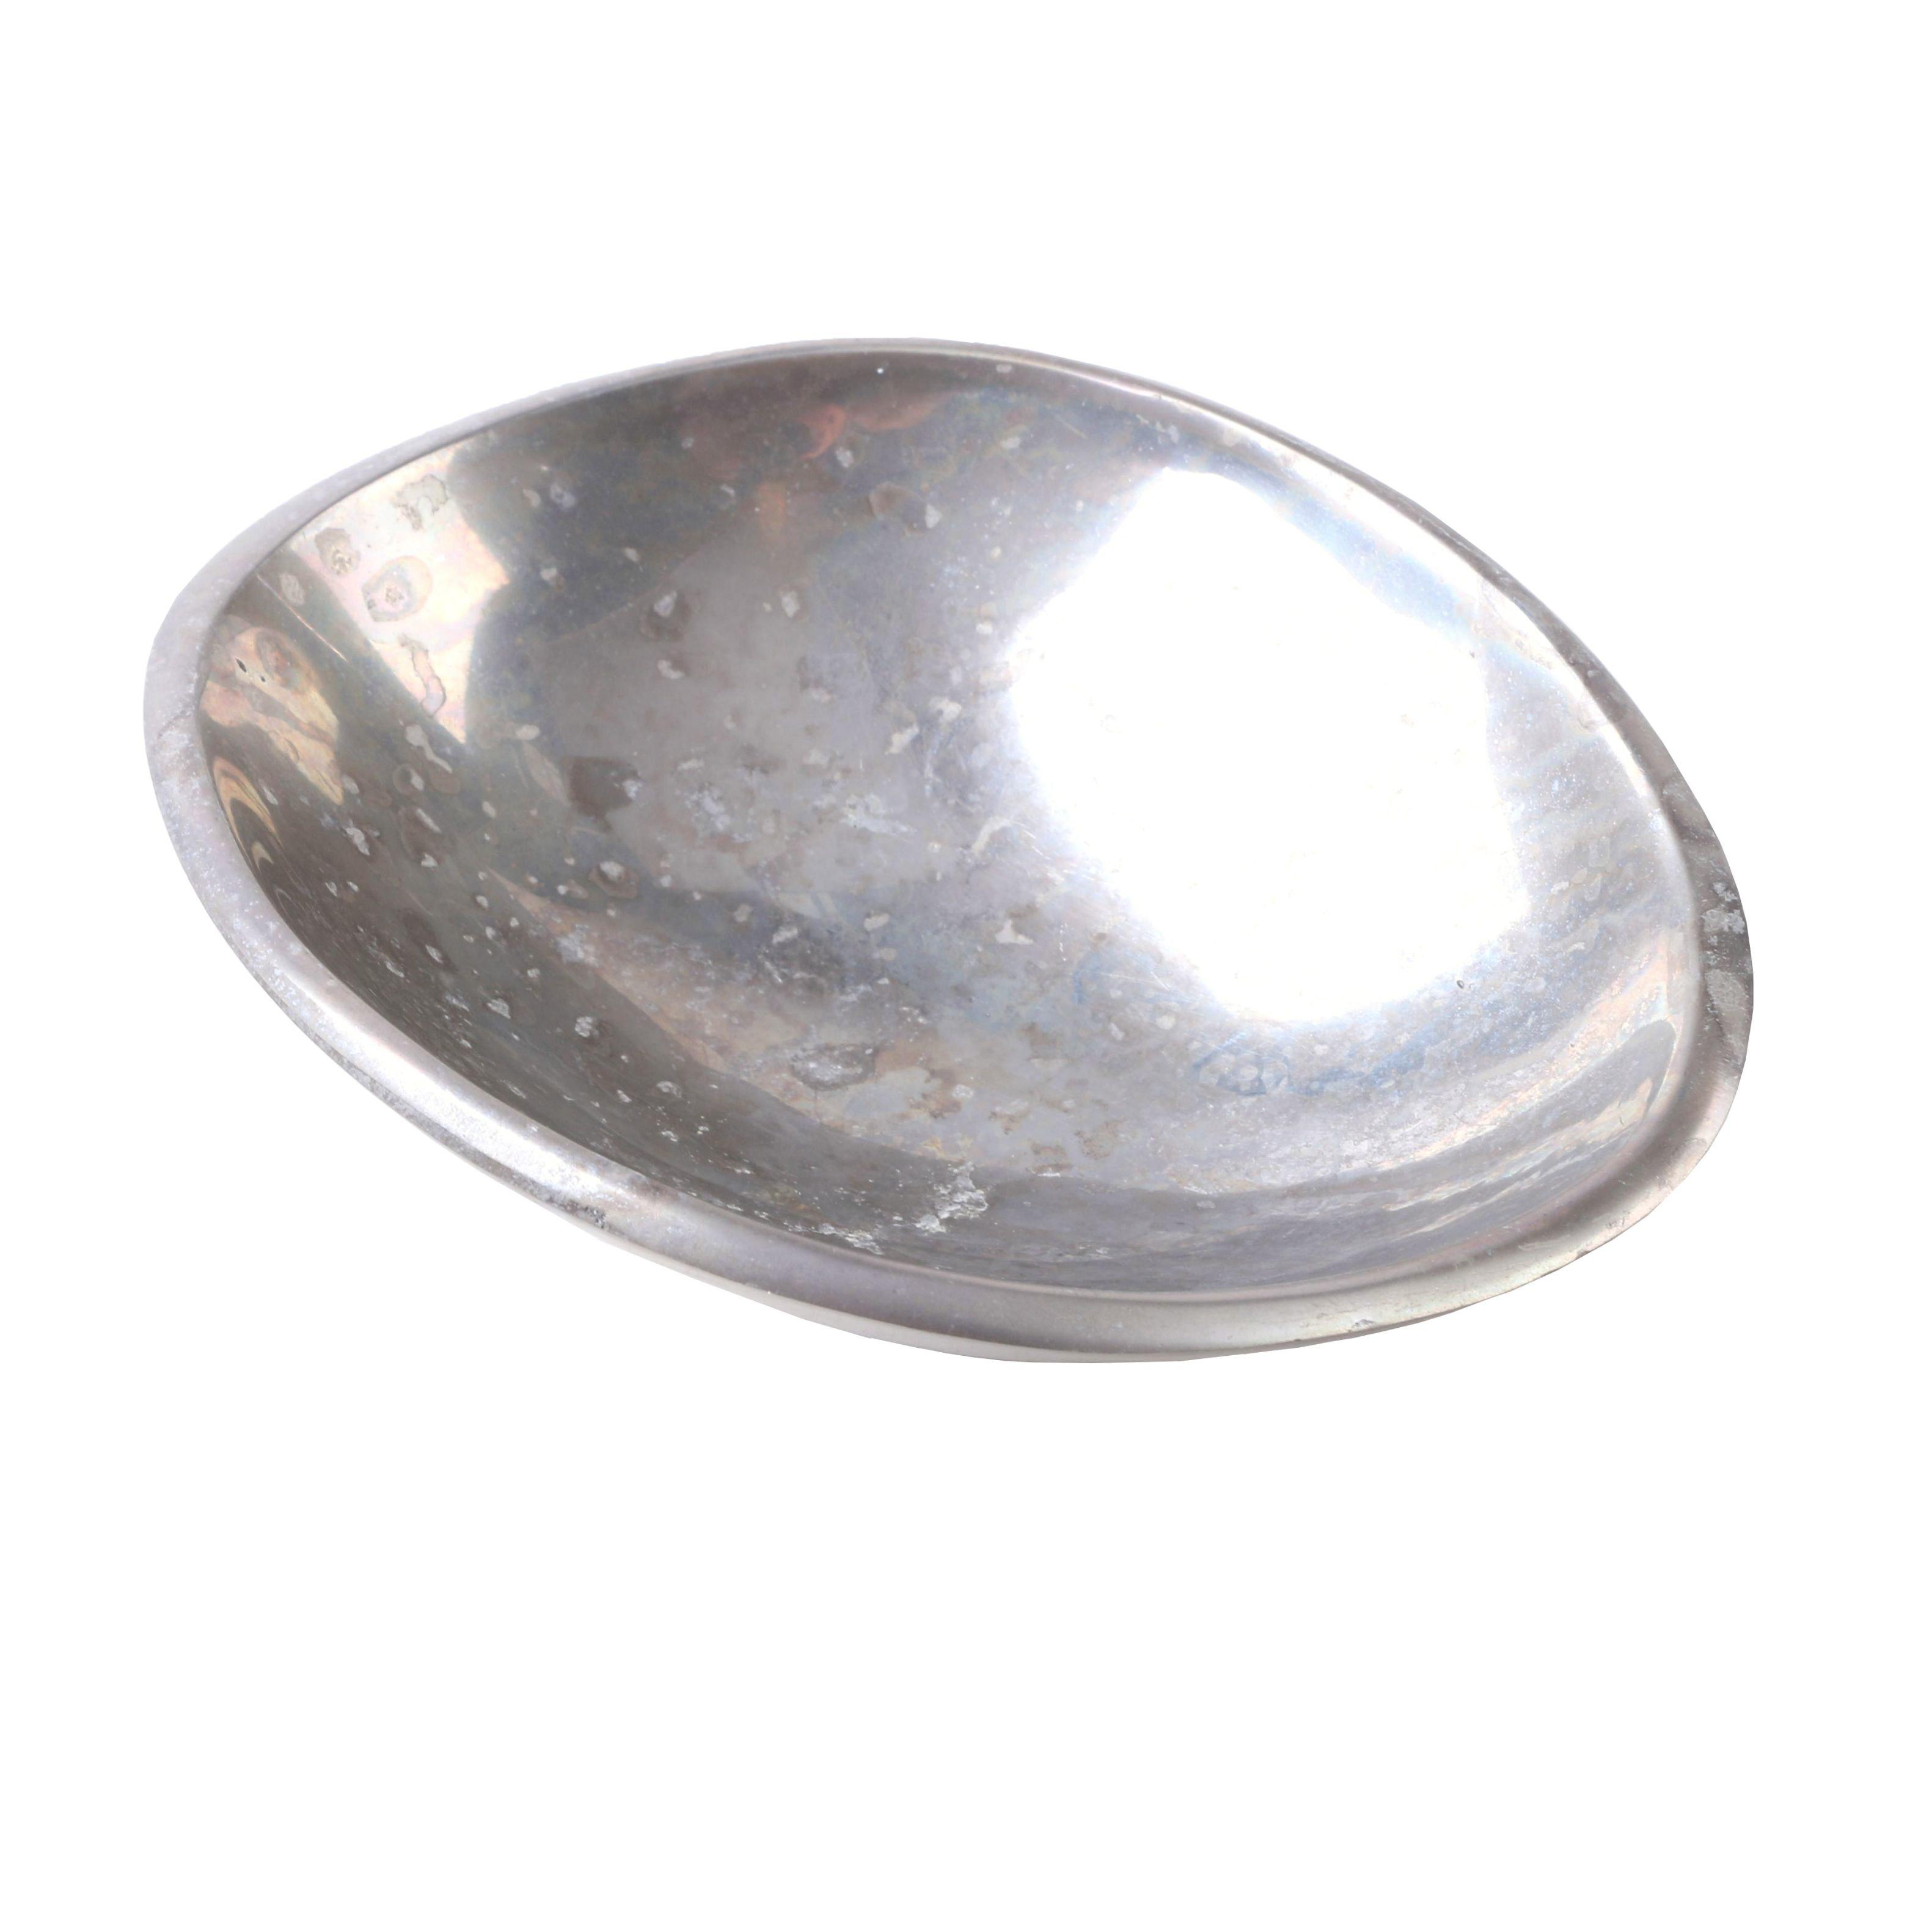 Modern Style Silver Alloy Bowl